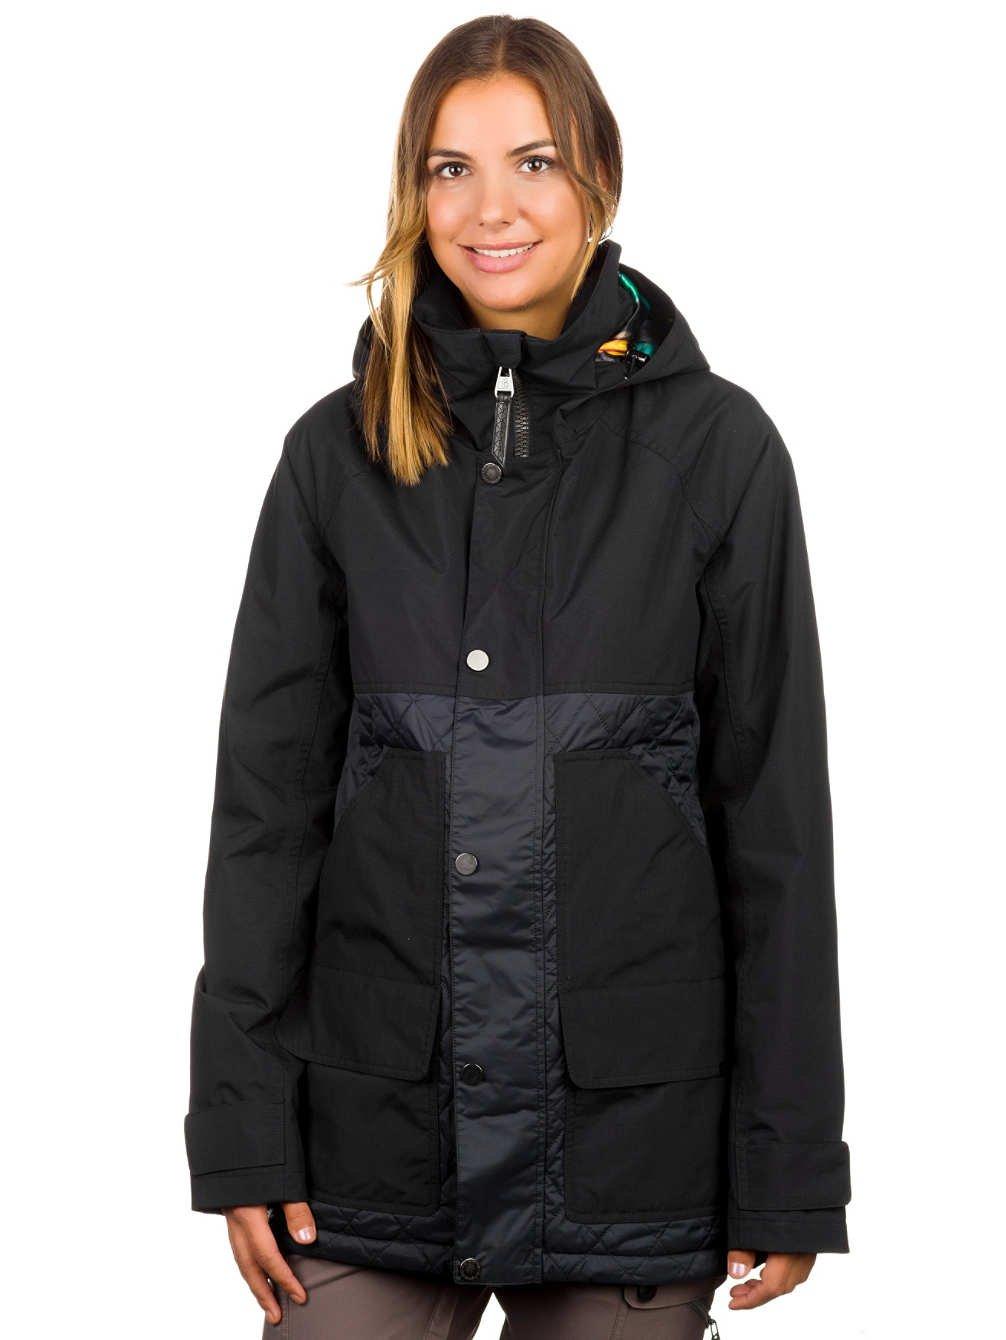 Damen Snowboard Jacke Burton Reese Parka Jacket